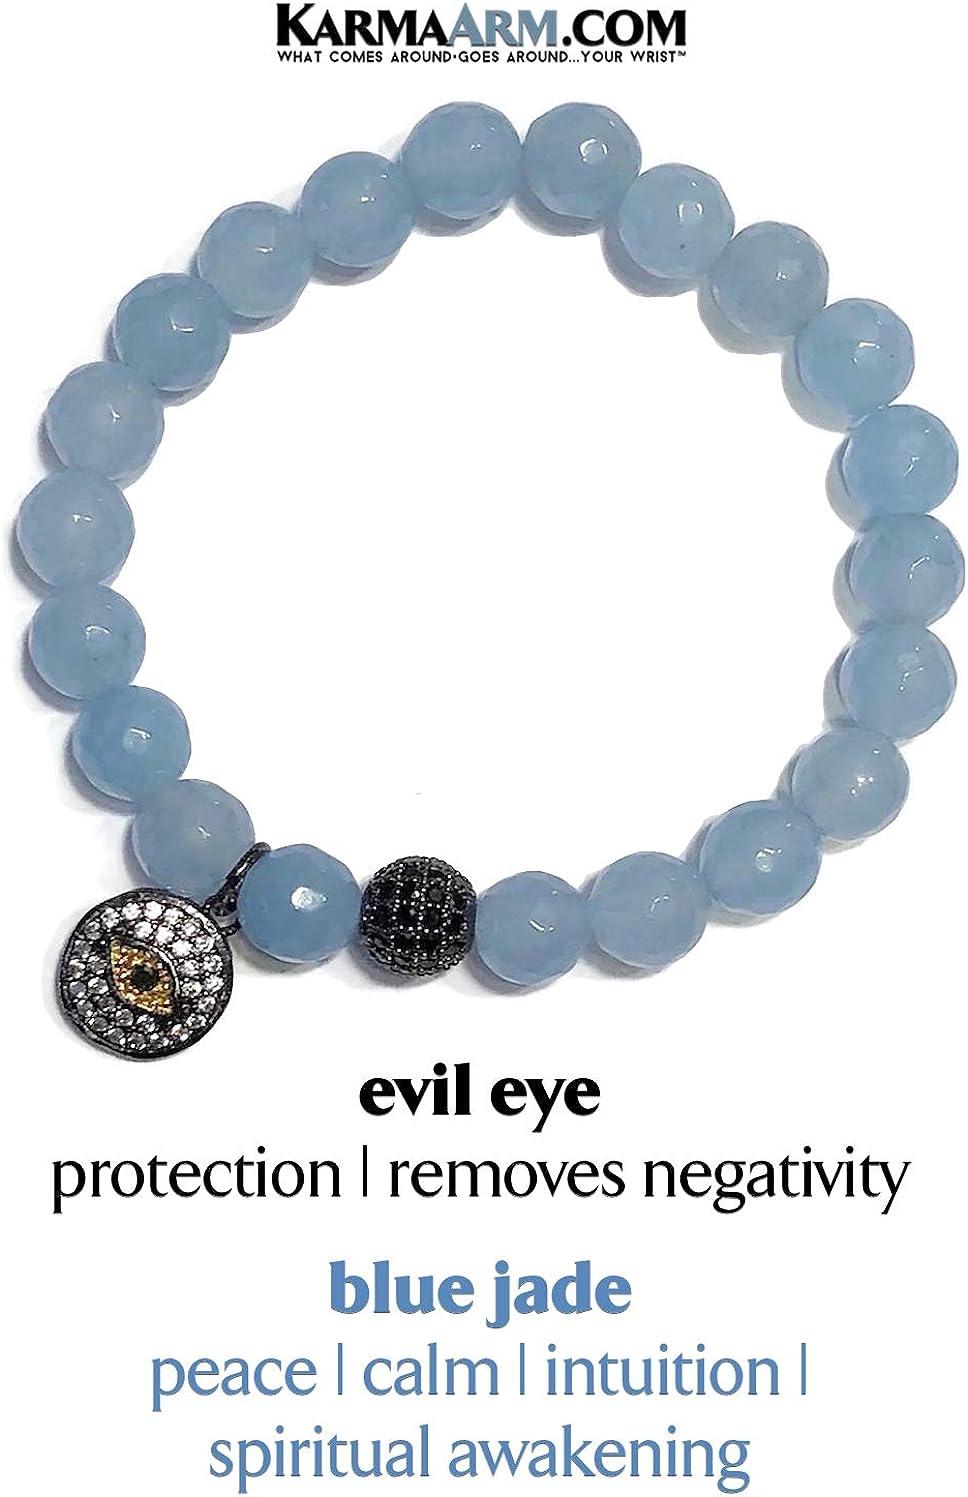 Dream Lover Blue Goldstone Reiki Healing KarmaArm Stretch Bracelets Yoga Chakra Love Bracelets Meditation Boho Jewelry